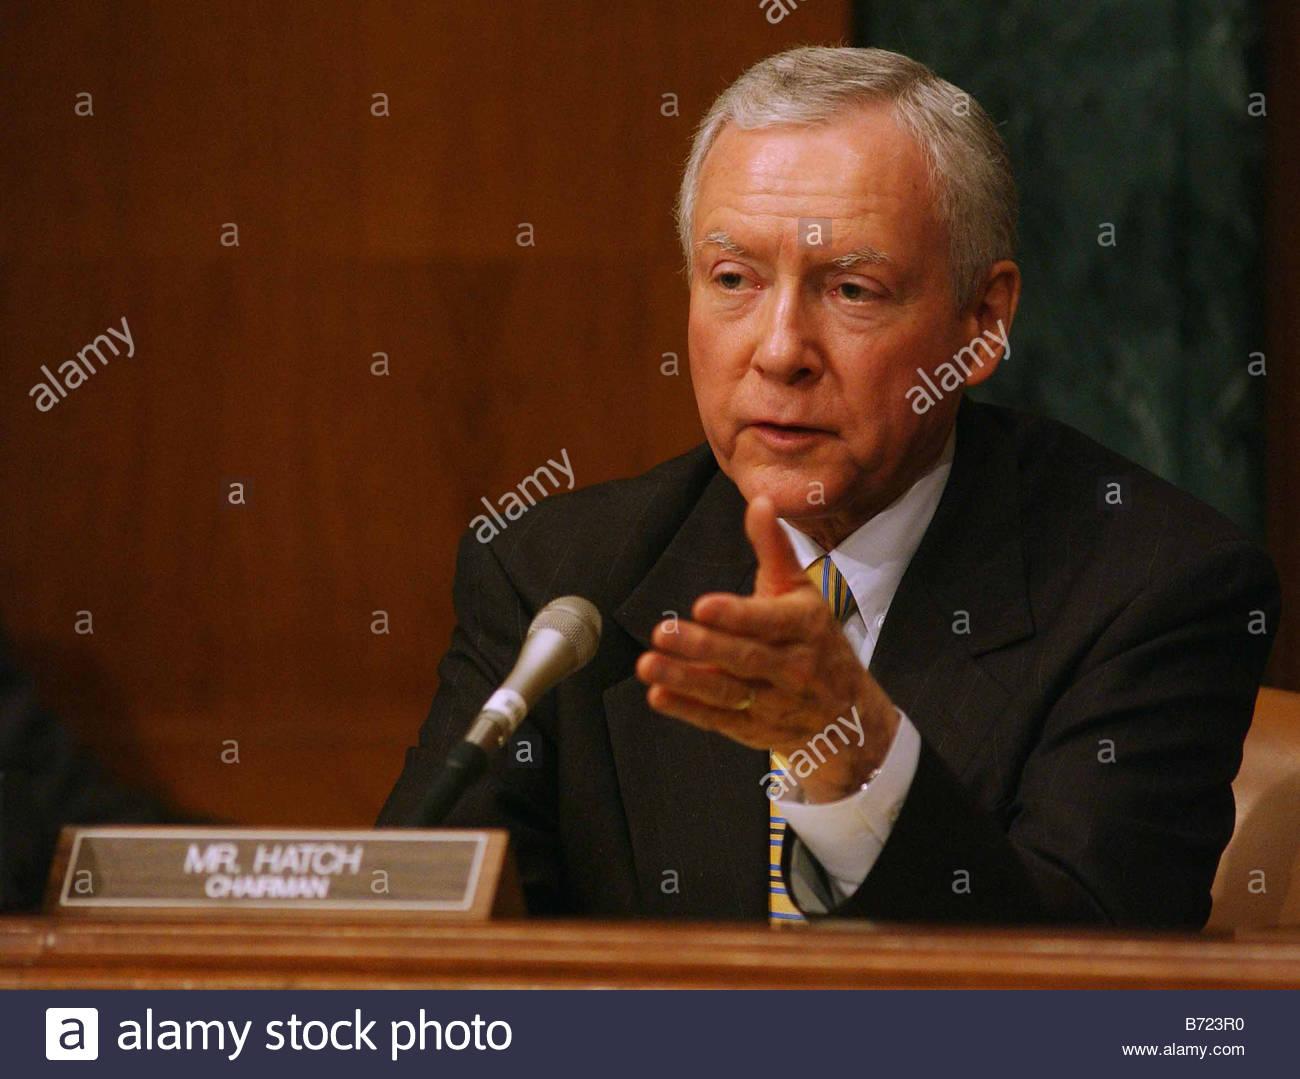 3 13 03 OWEN NOMINATION Senate Judiciary Chairman Orrin G Hatch R Utah during the nomination hearing for Priscilla - Stock Image